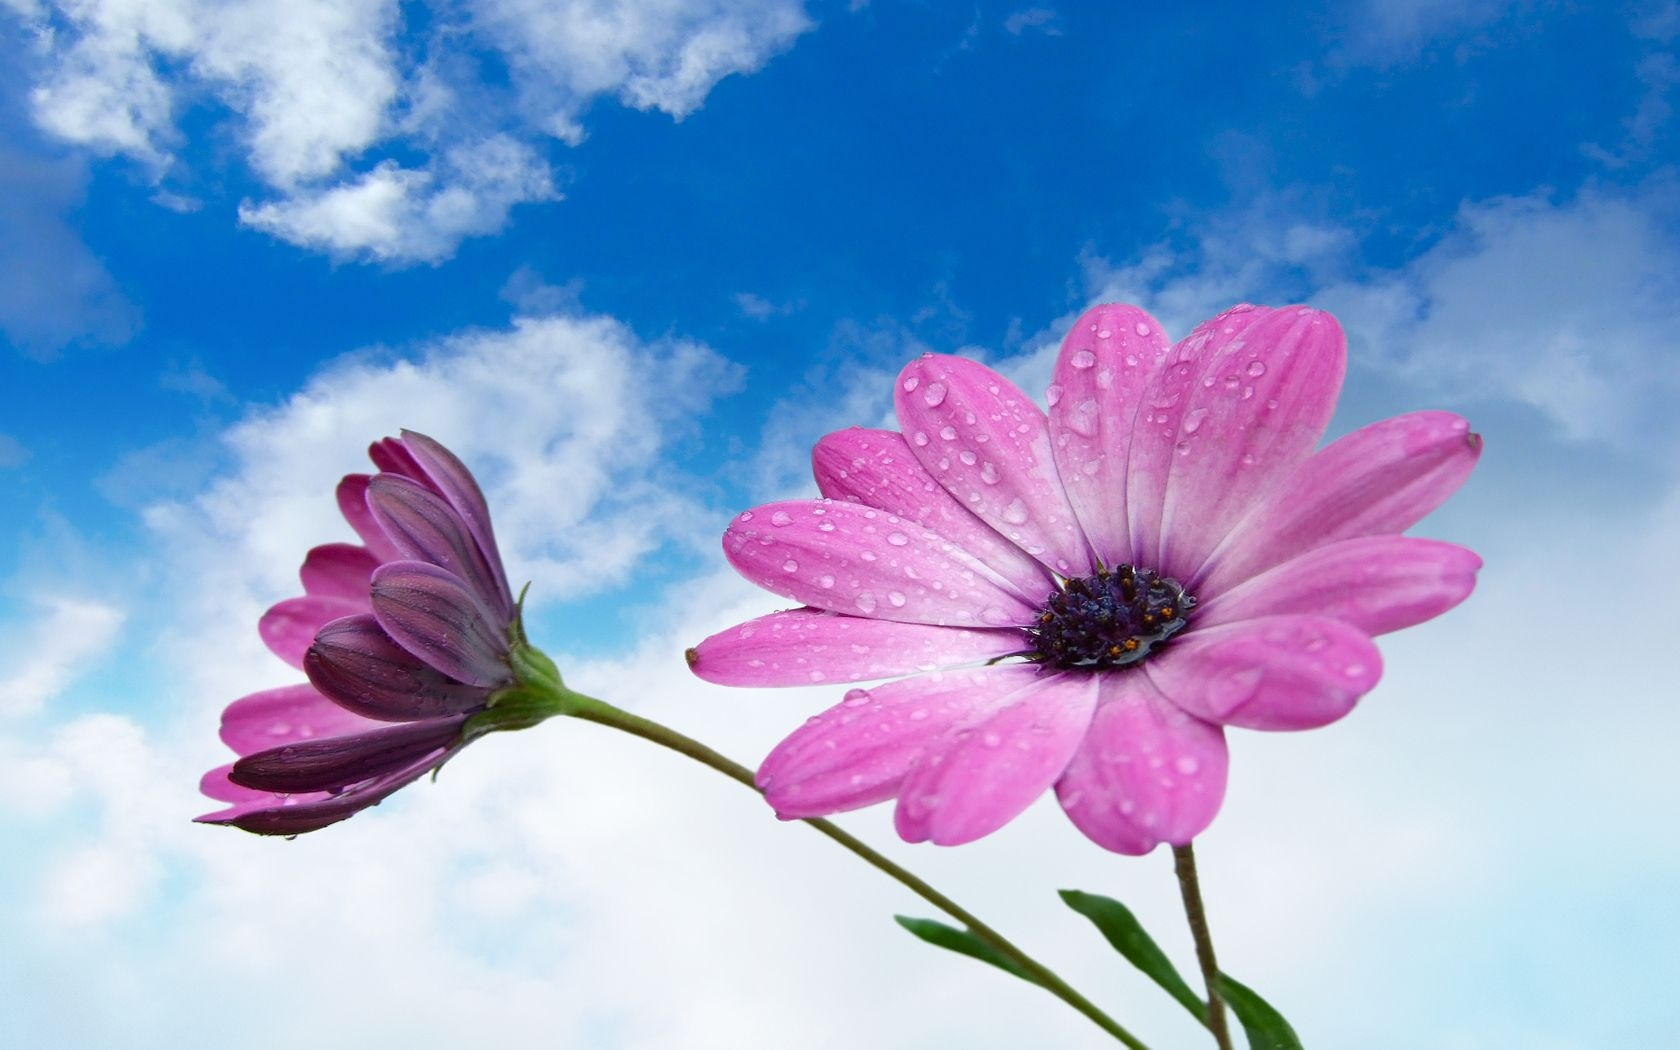 pink and purple flower wallpaper - HD Desktop Wallpapers ...